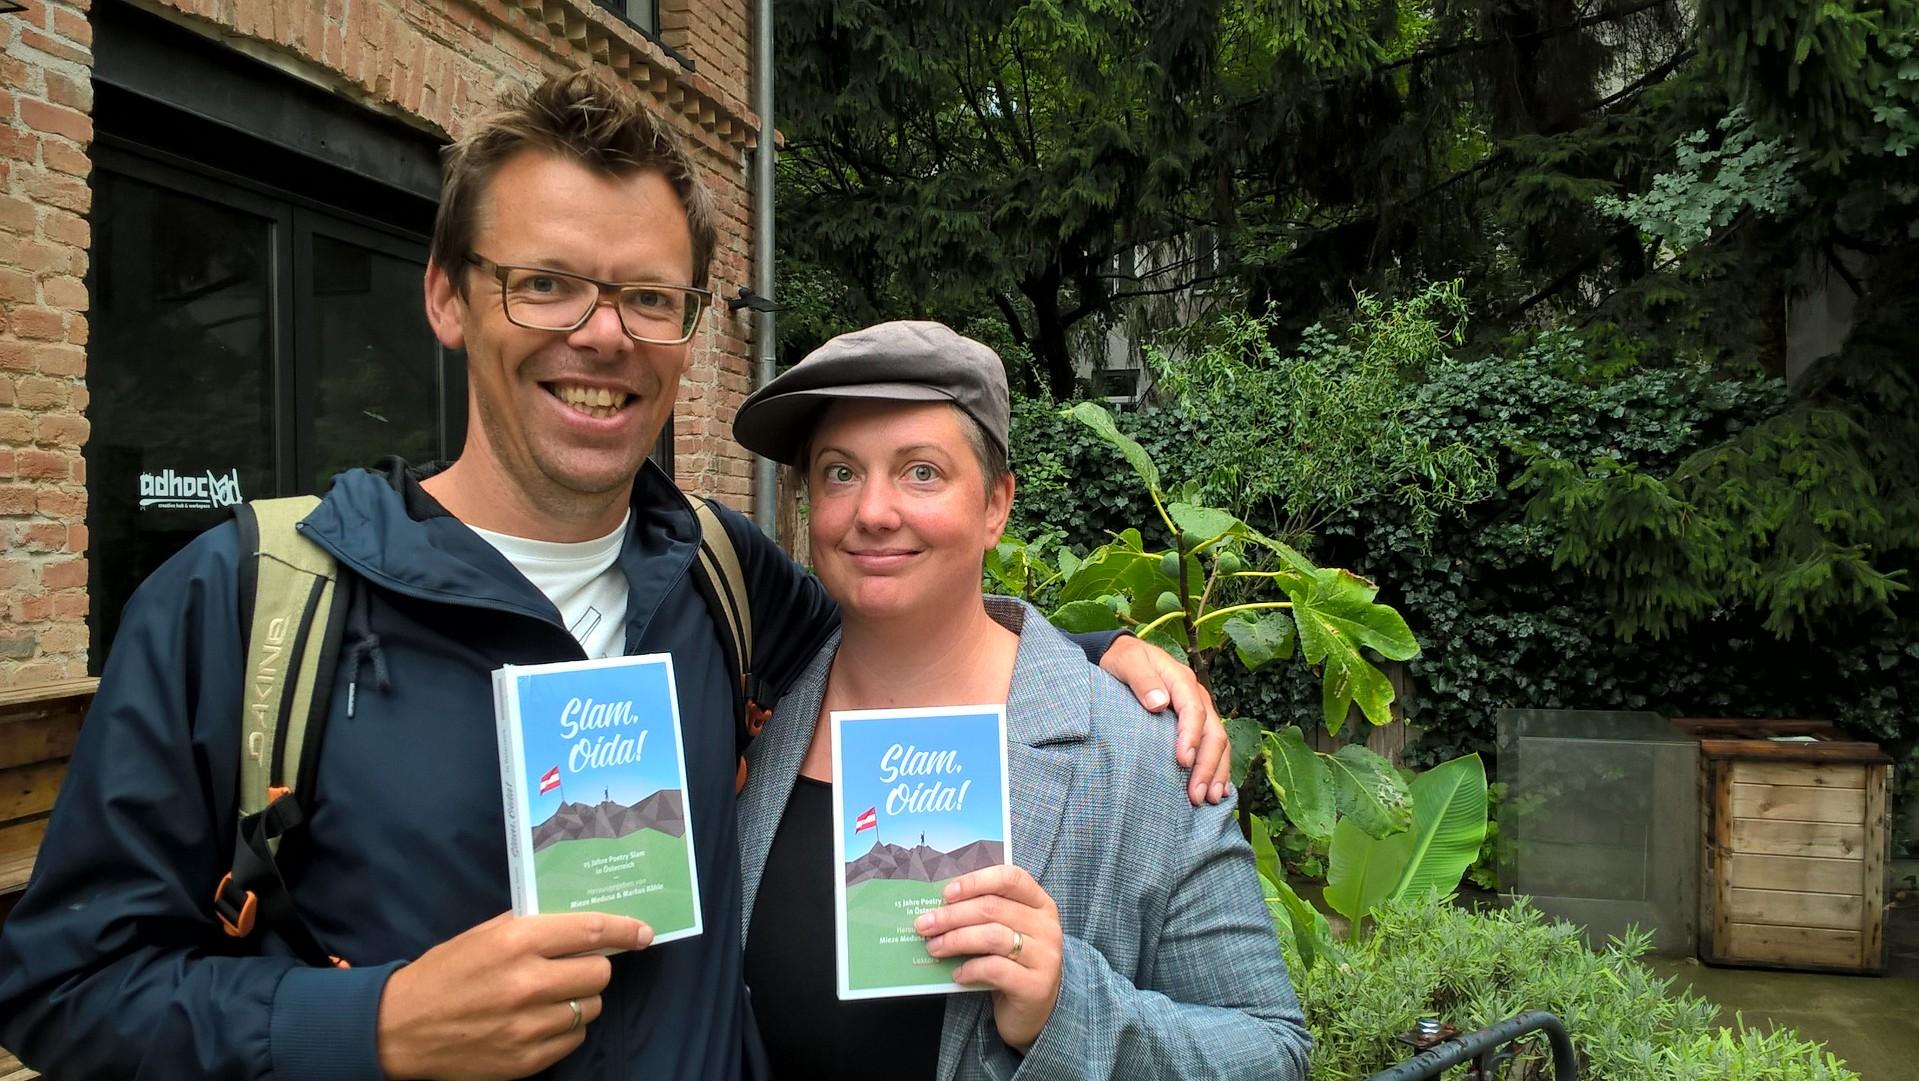 Slam Oida, Poetry Slam in Österreich